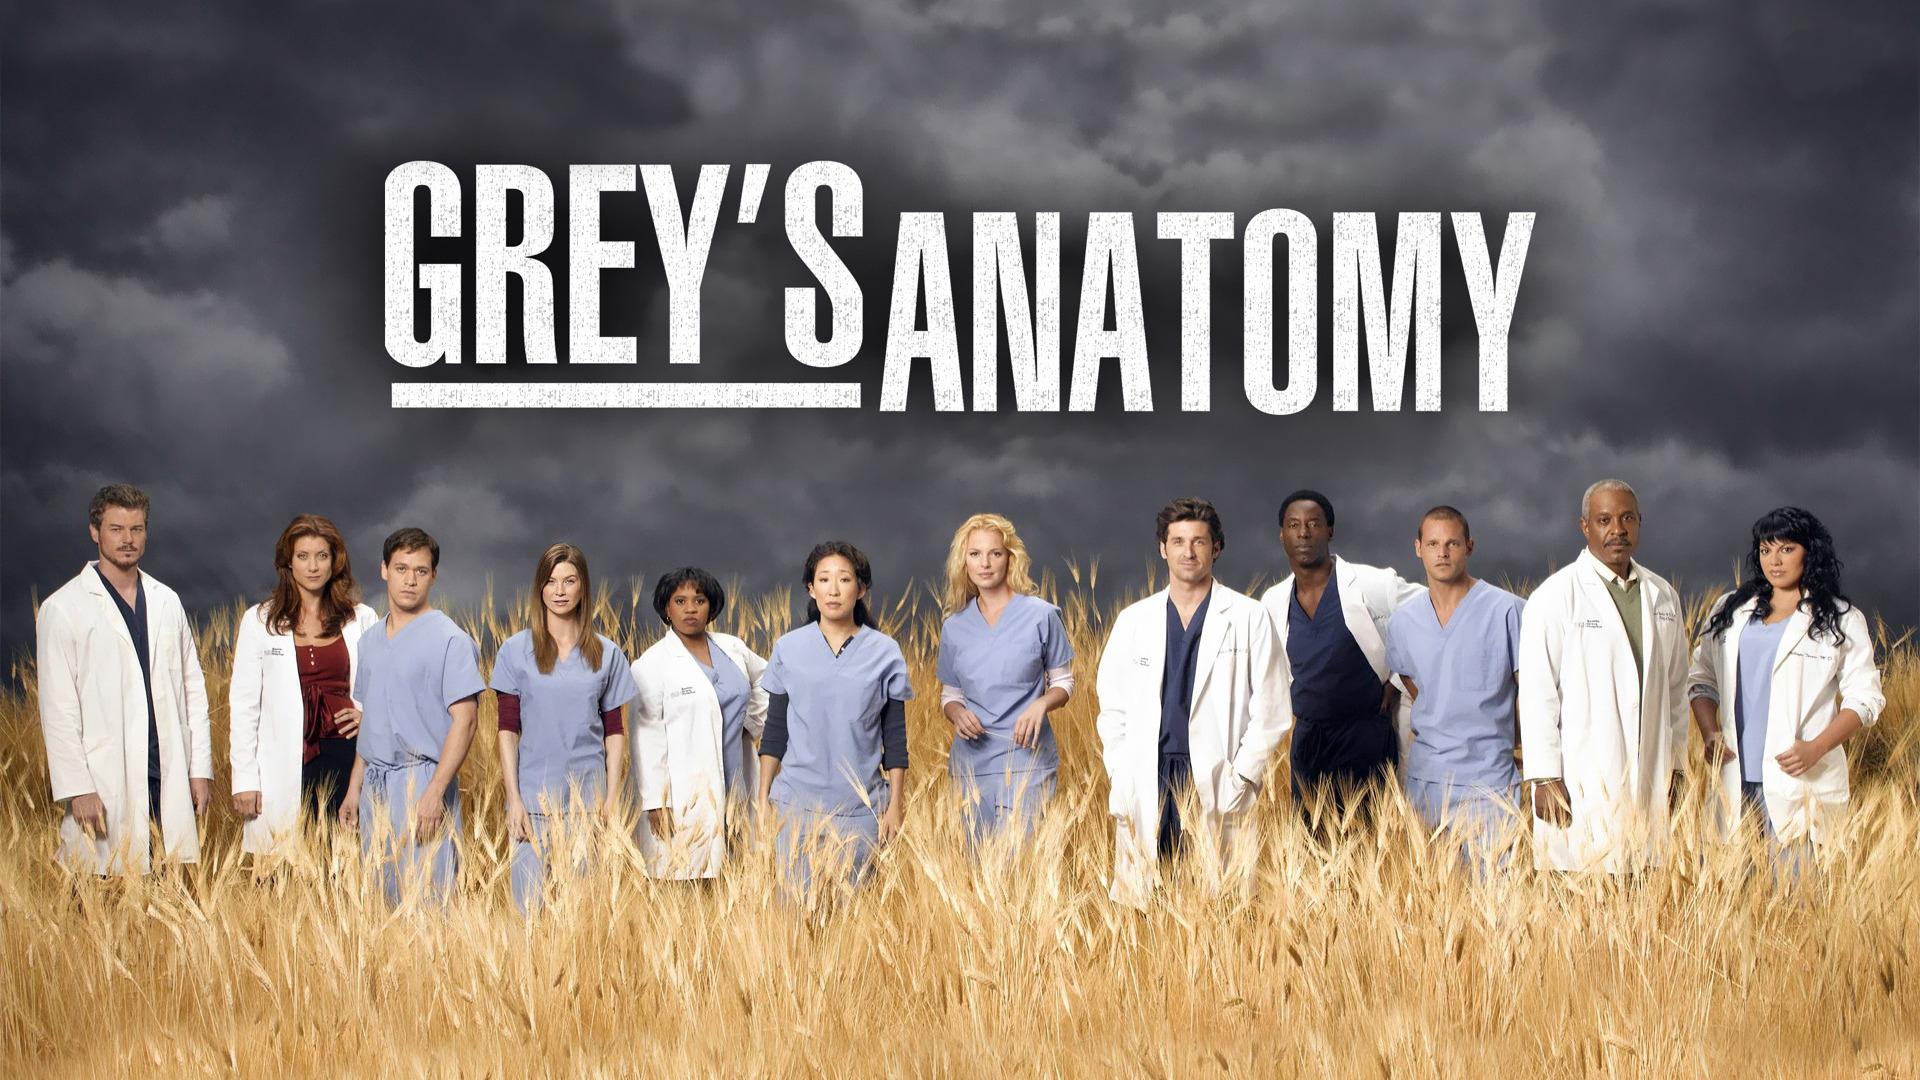 Greys Anatomy savoir ville